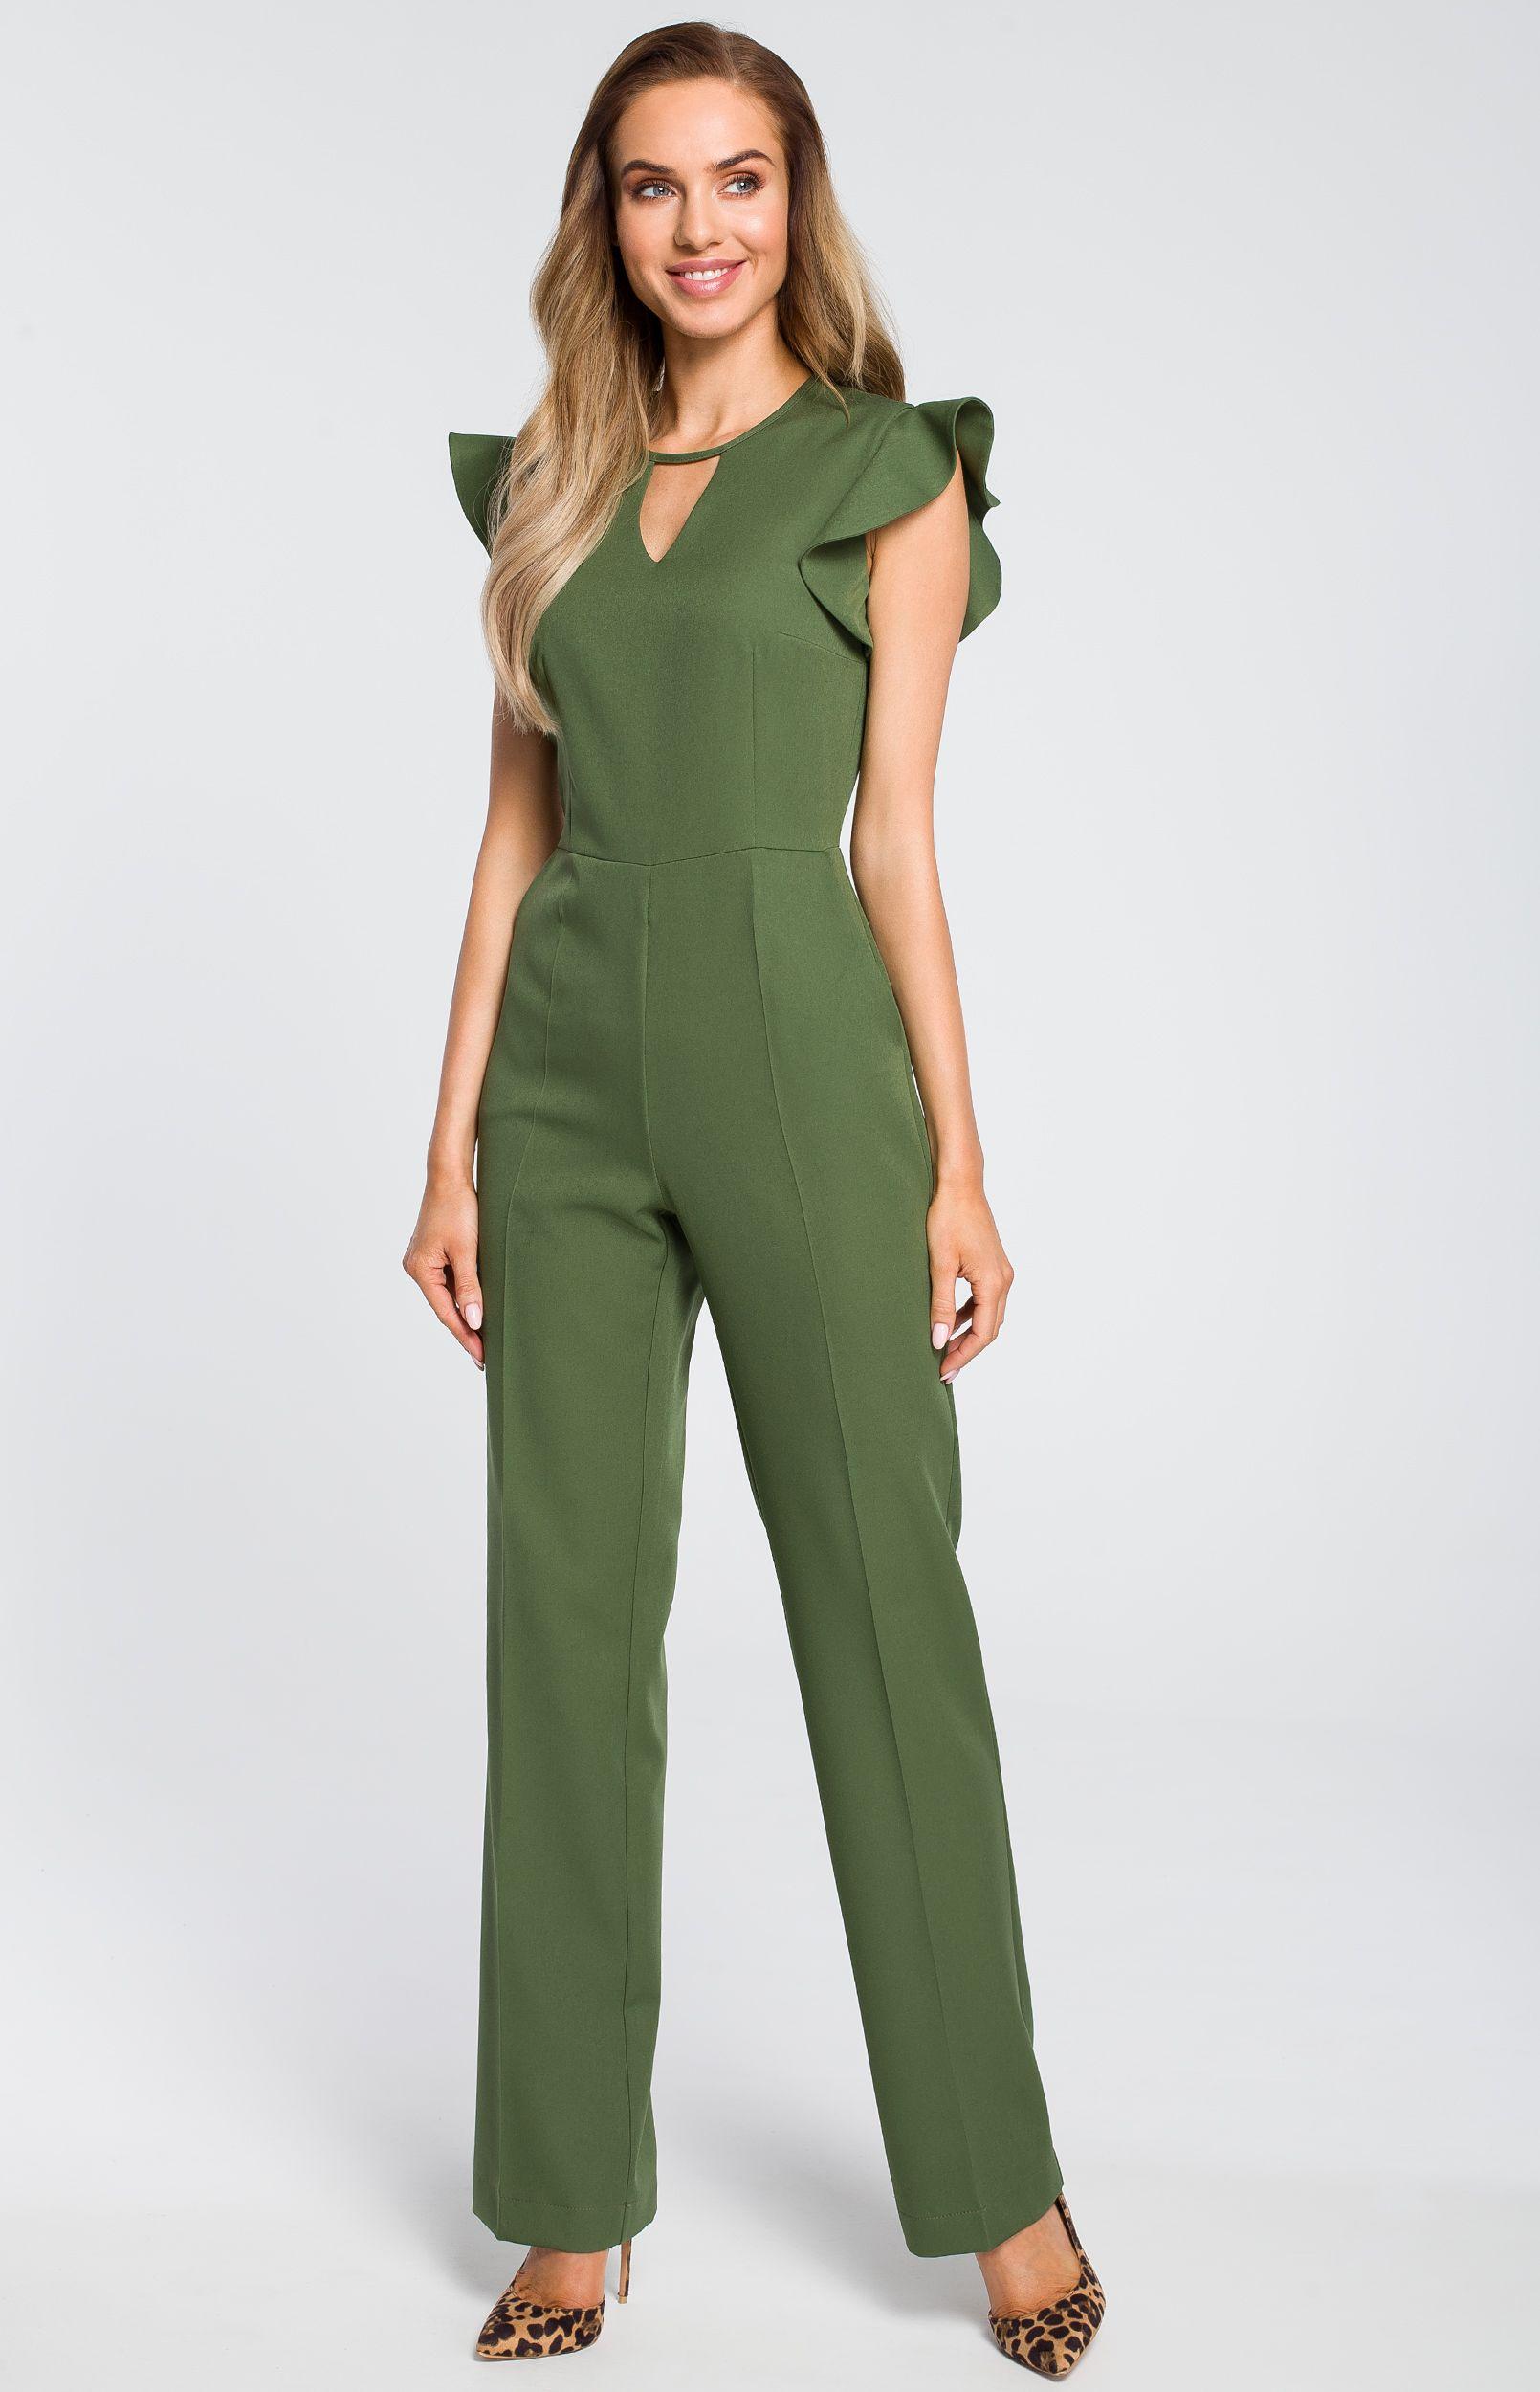 Pantalon Volantées Vert Combinaison Manches Olive QerdBWECxo